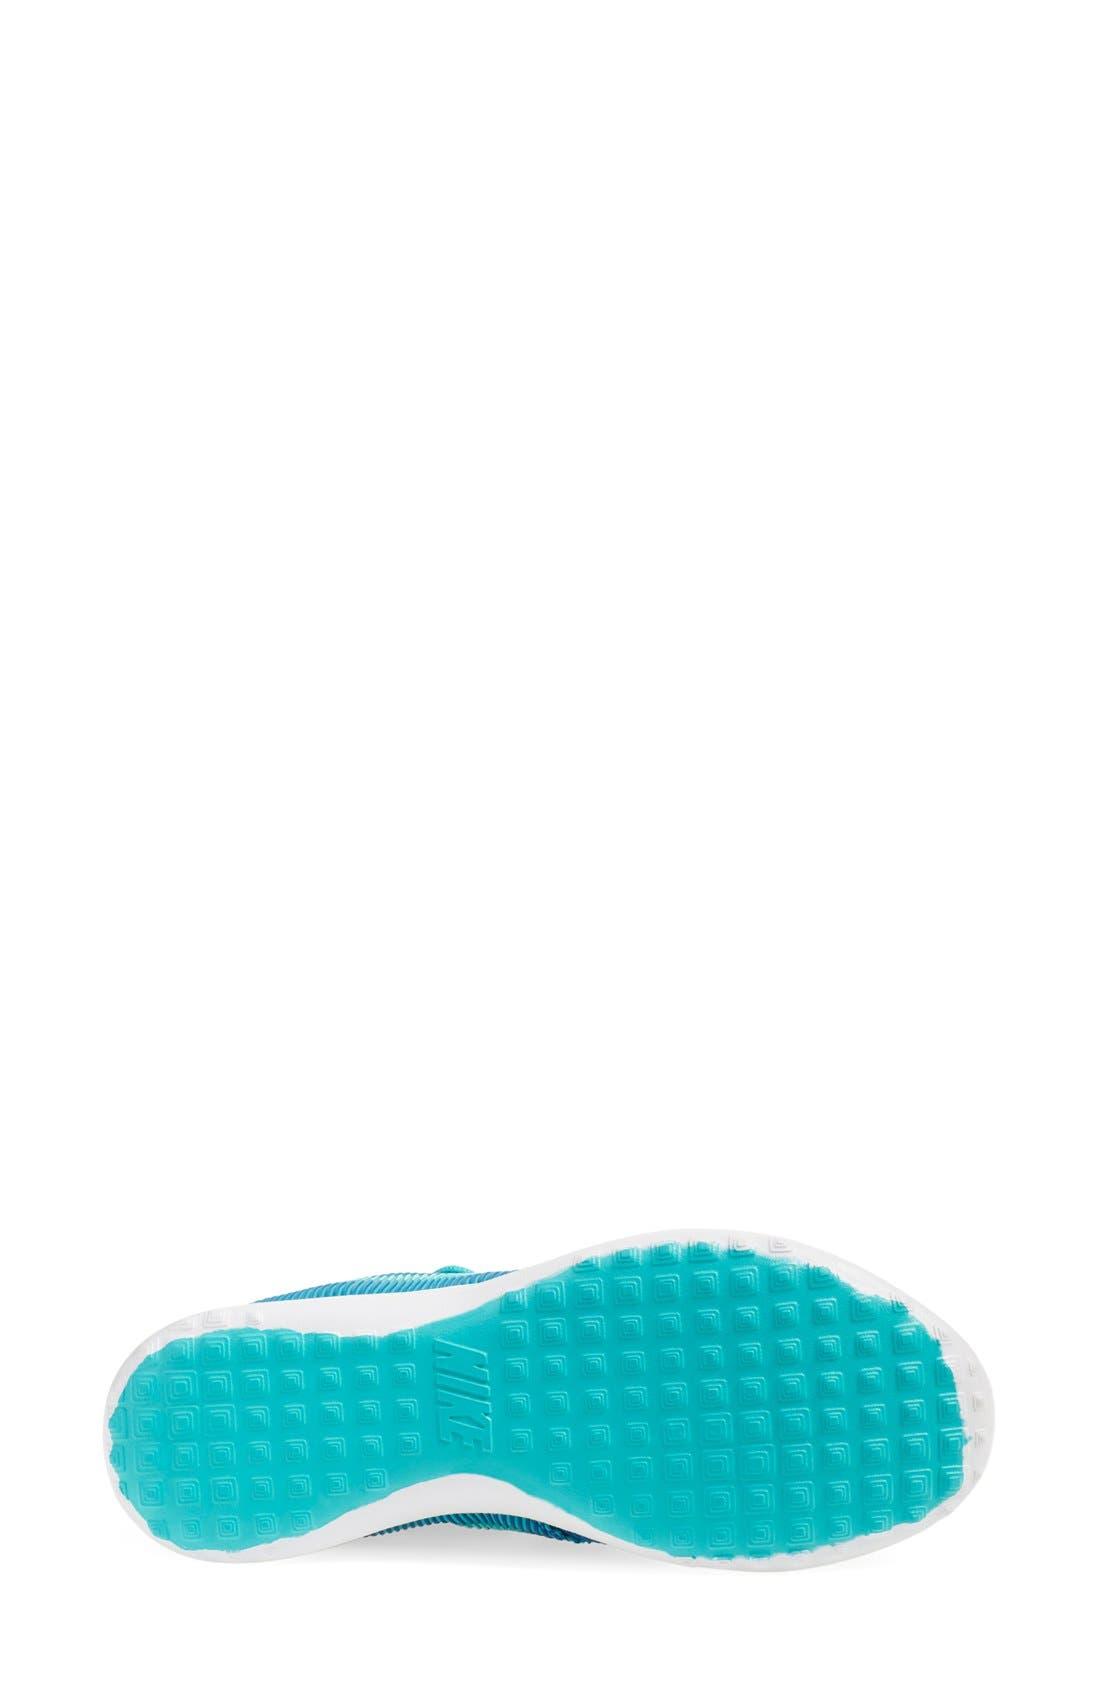 Juvenate Sneaker,                             Alternate thumbnail 190, color,